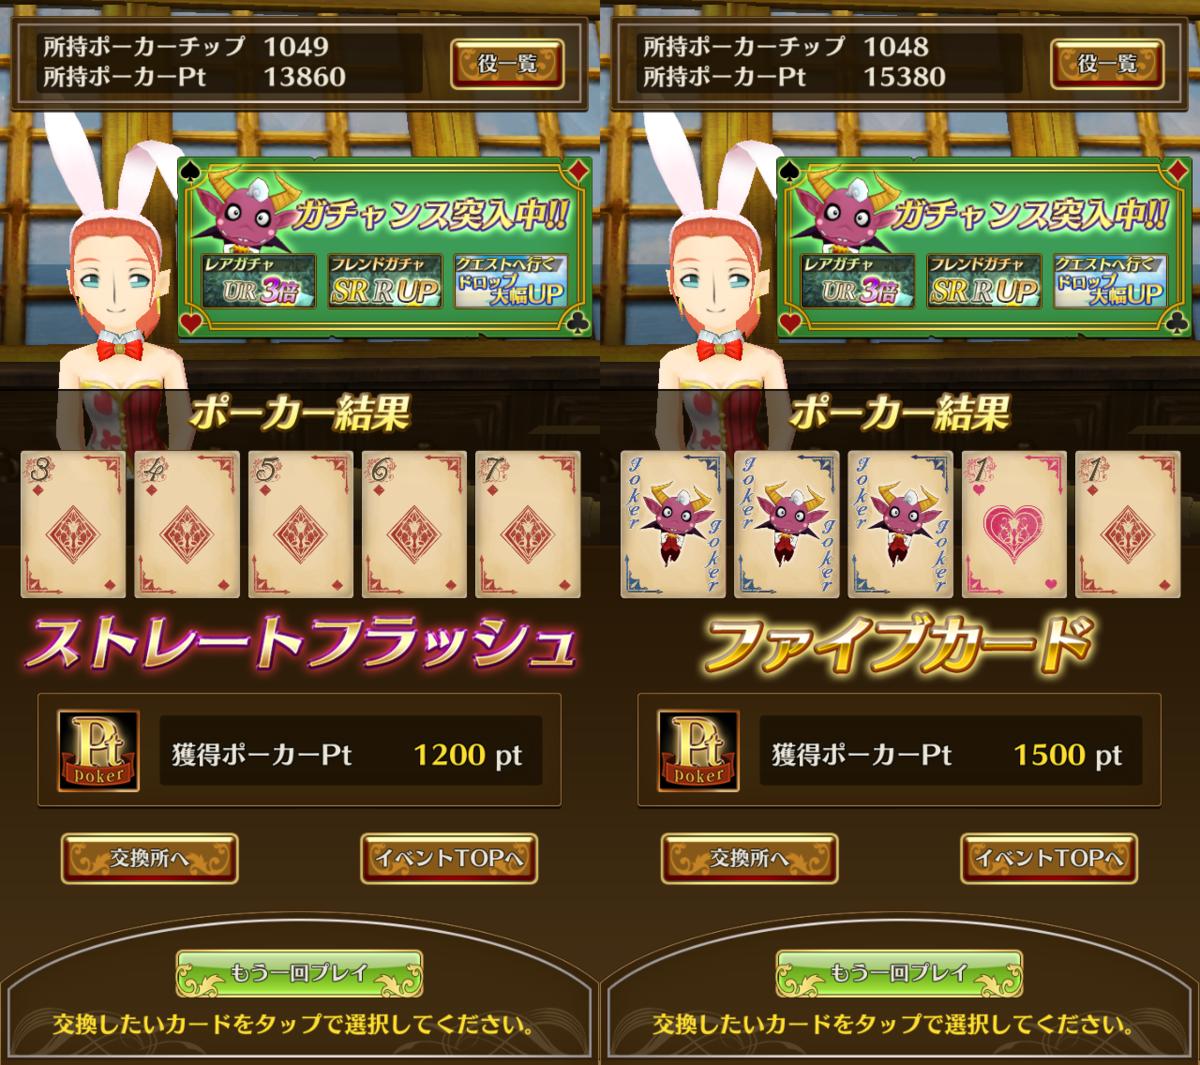 f:id:saki_yukino:20200213200913p:plain